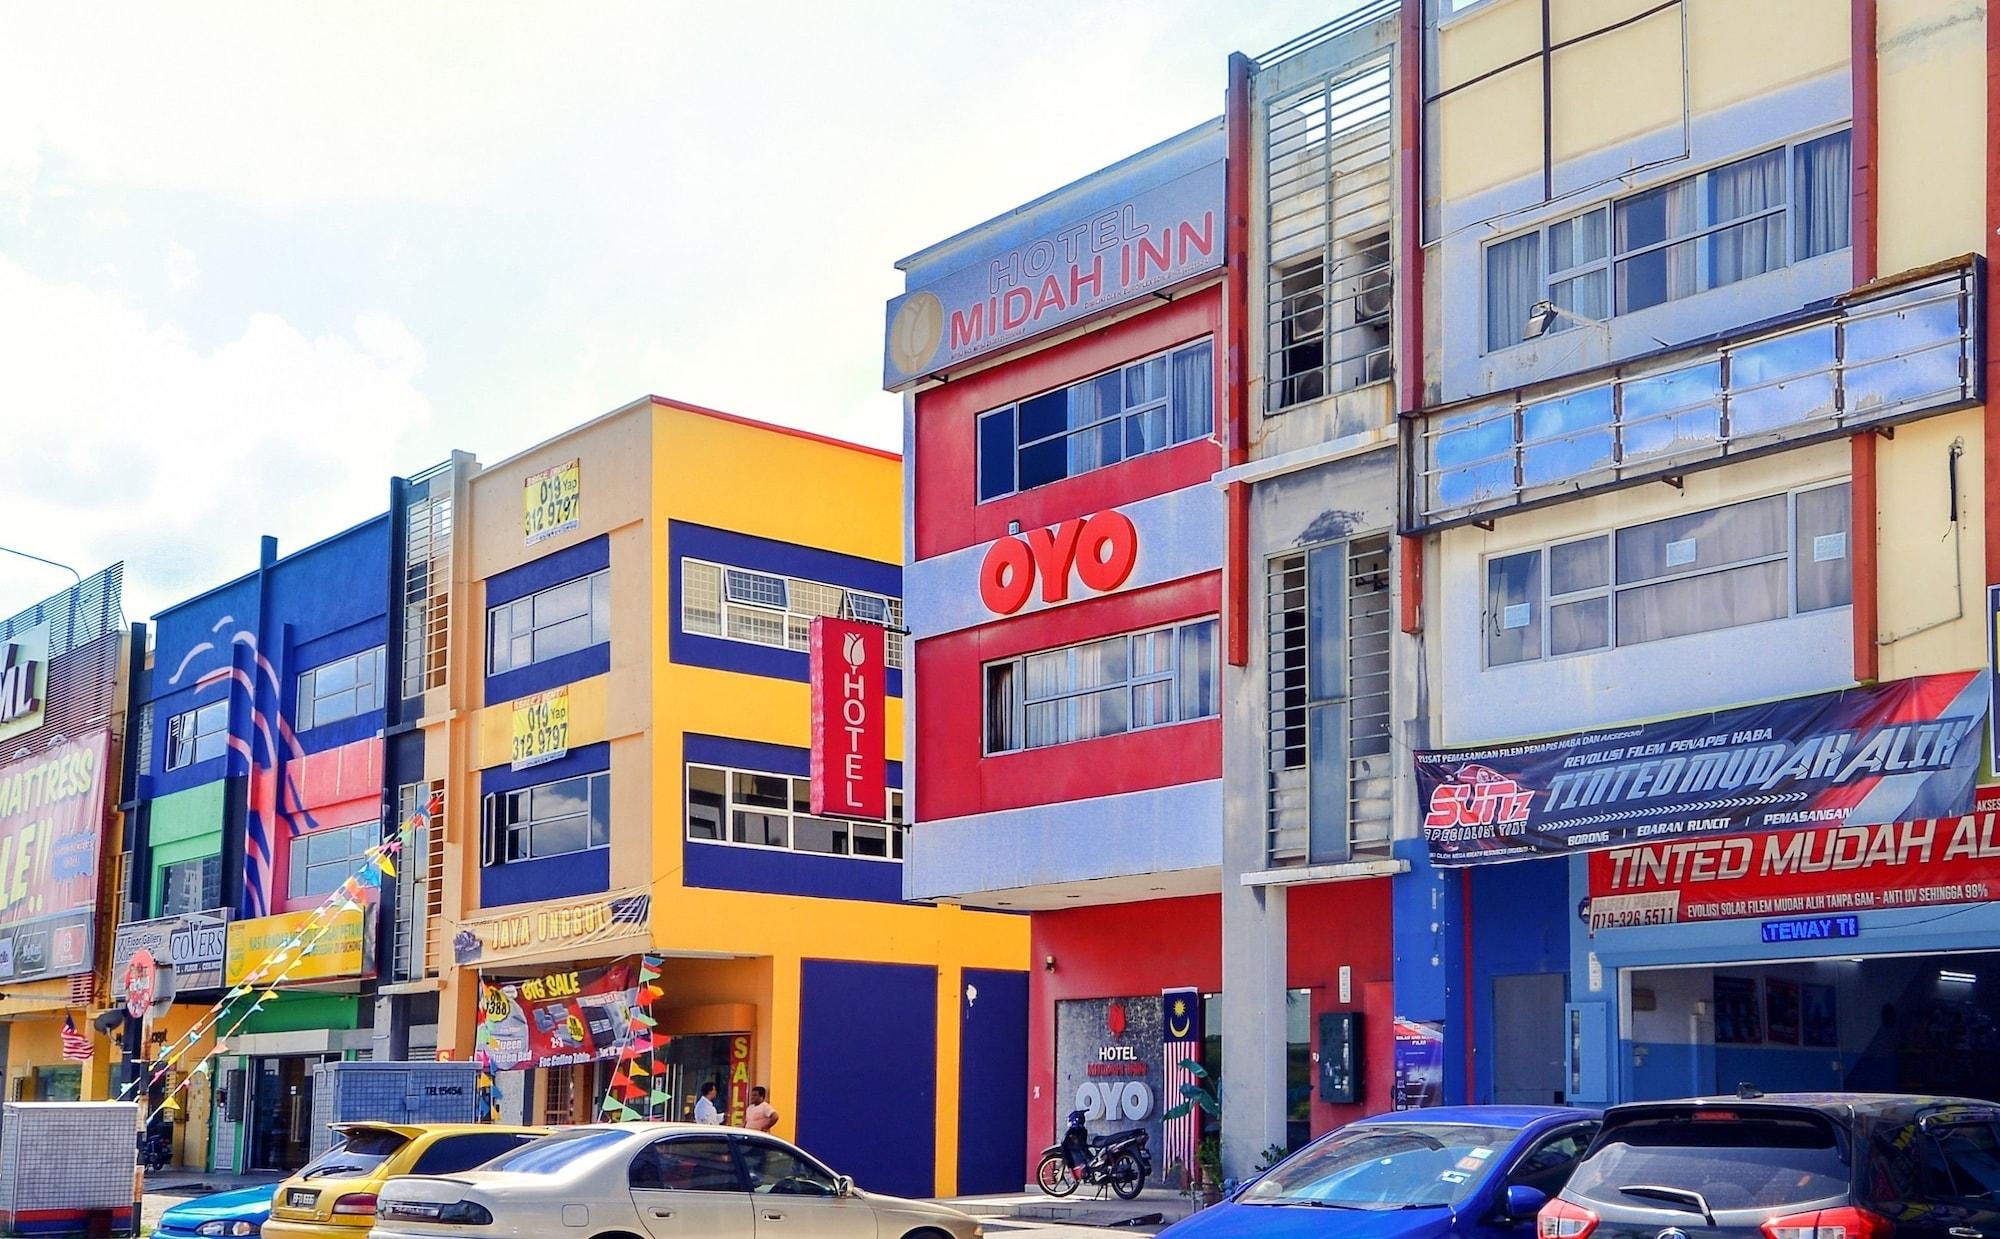 OYO 502 Midah Inn Puchong, Kuala Lumpur